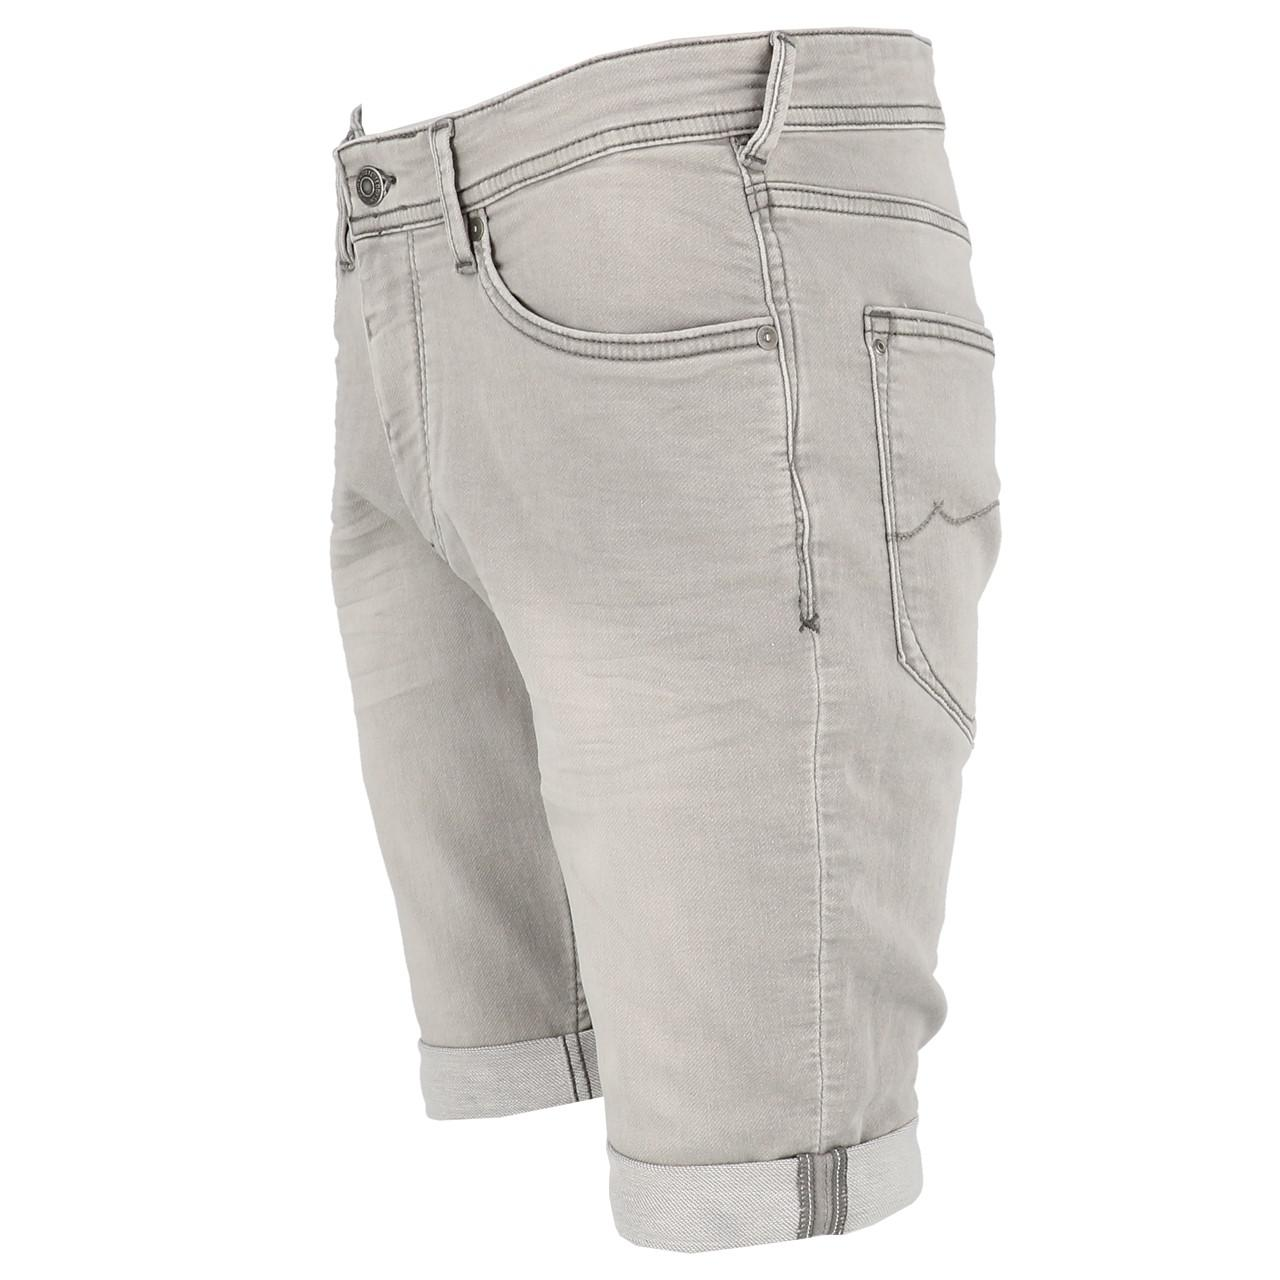 Bermuda-Shorts-Teddy-smith-Scotty-3-Grey-Shorts-Grey-29920-New thumbnail 2